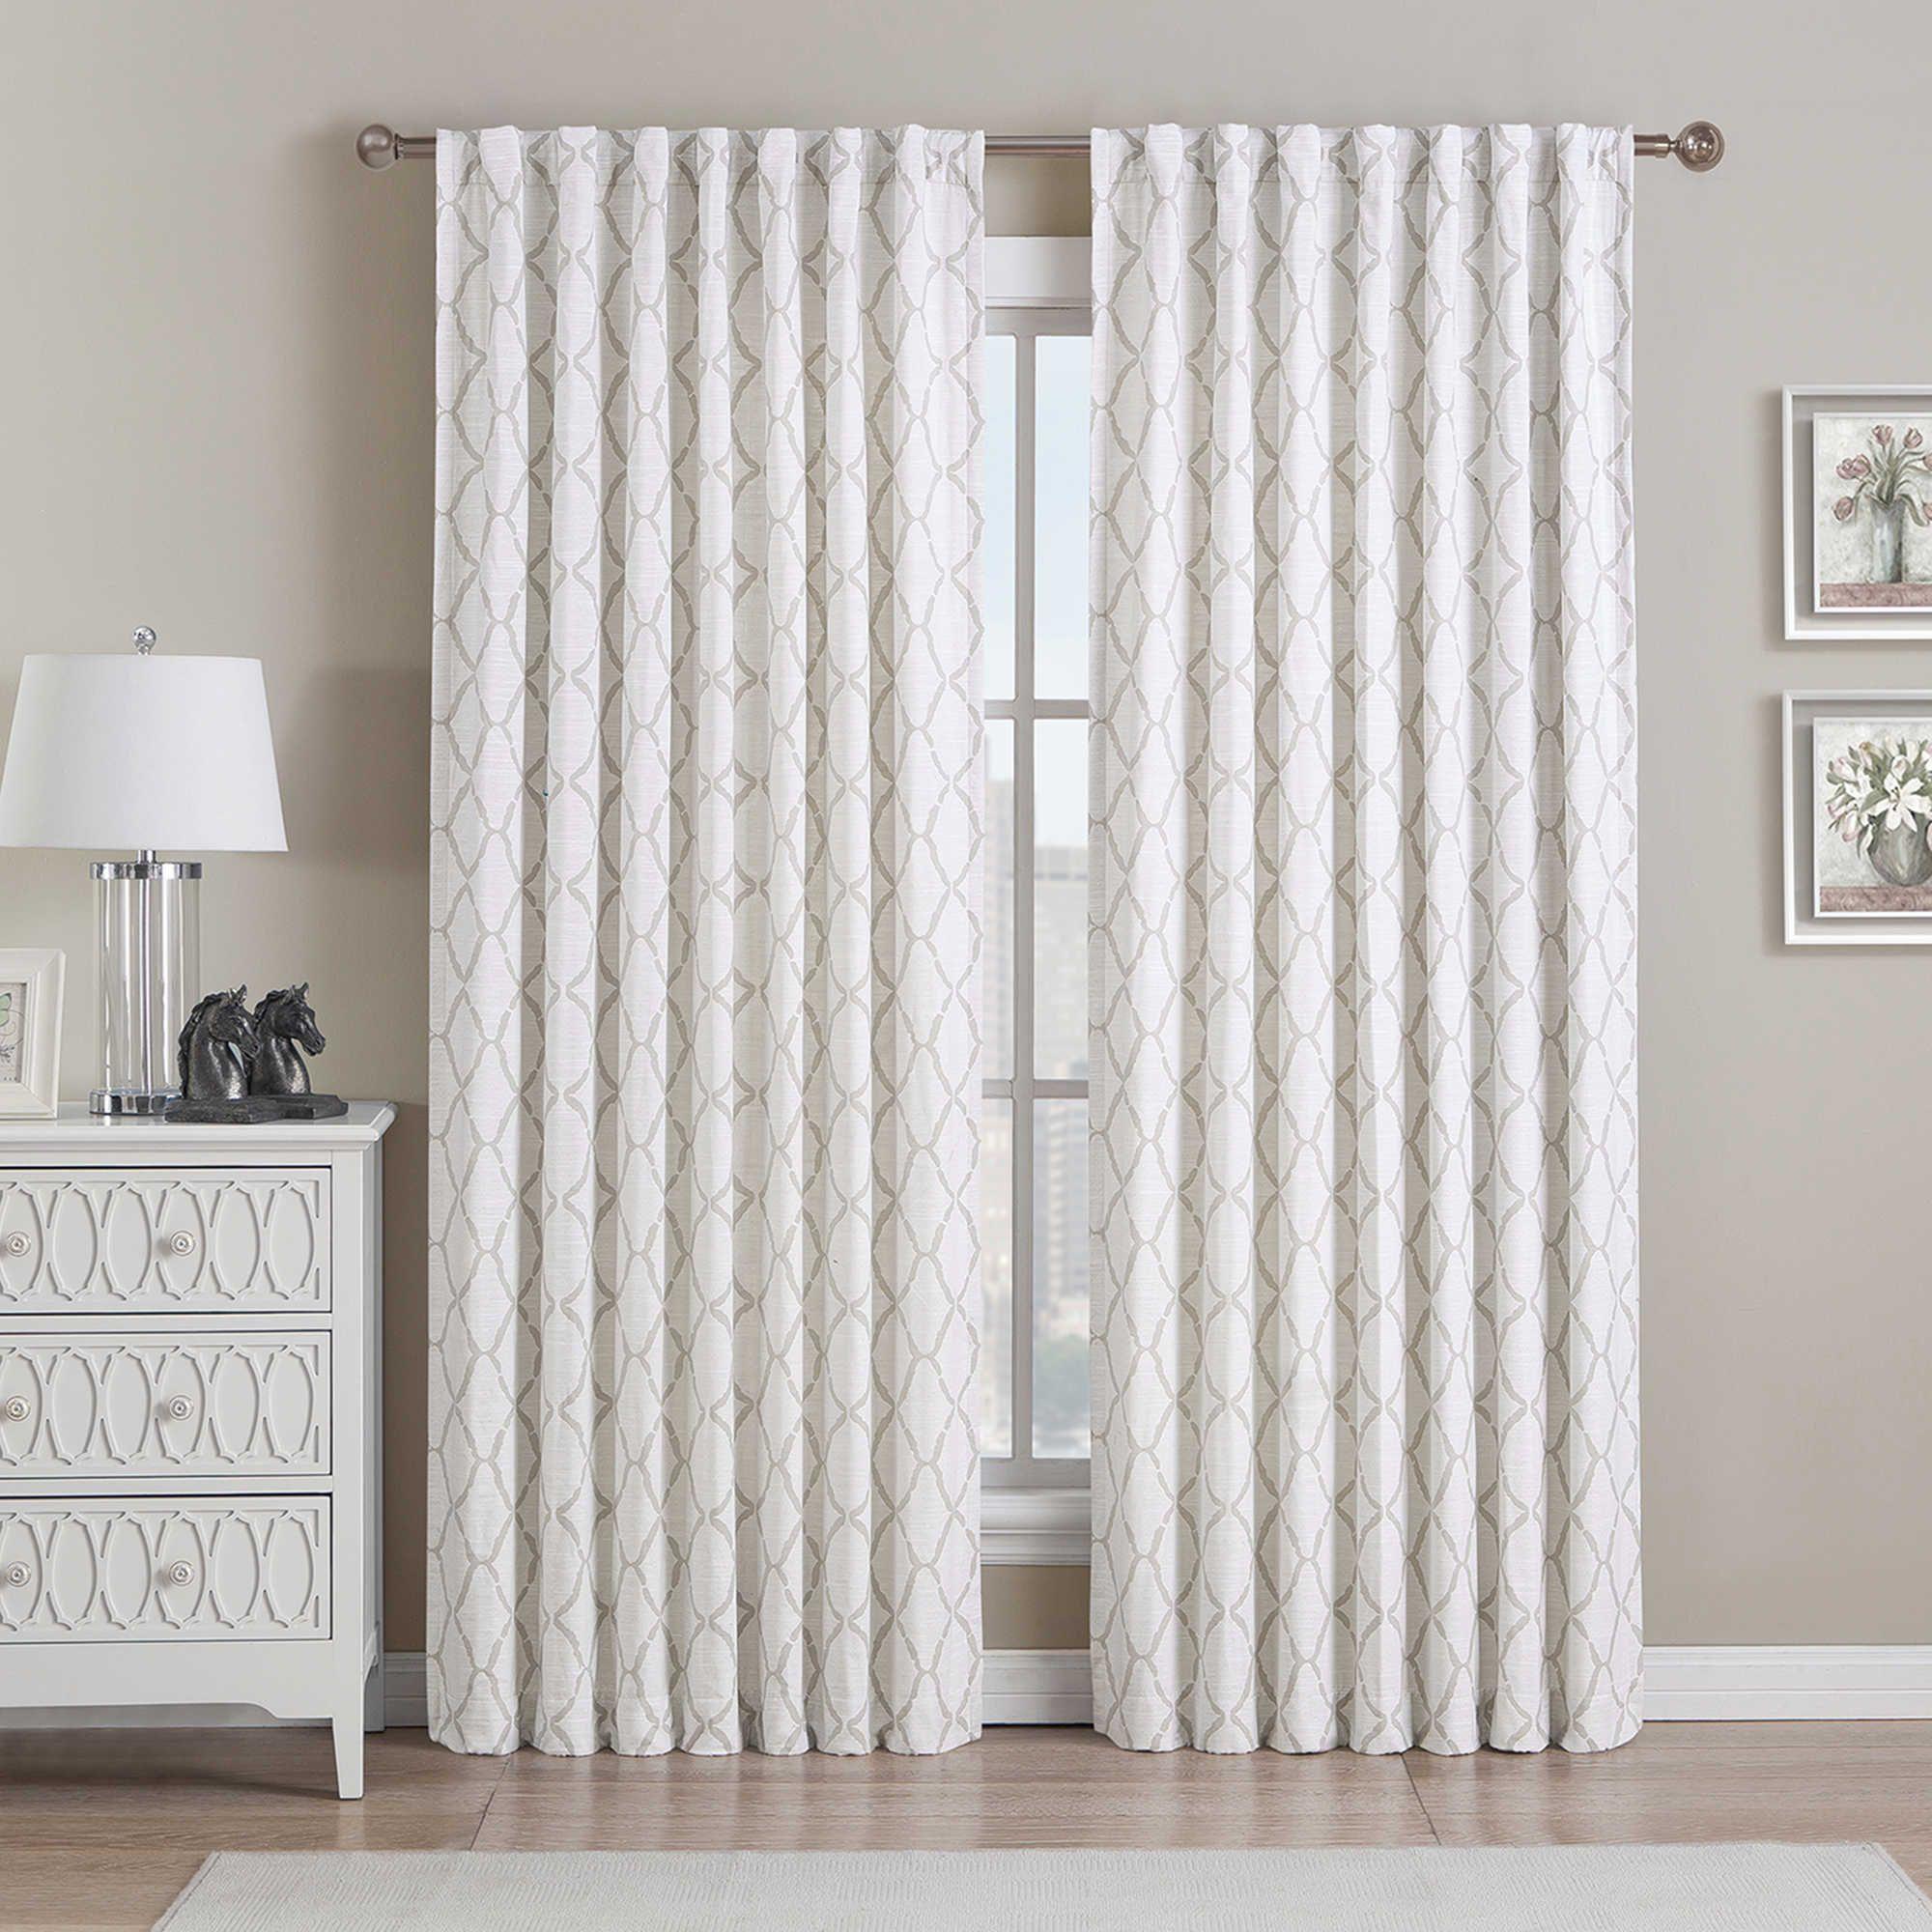 Bed bath and beyond window curtains  be artistic ellis oval rod pocketback tab window curtain panel